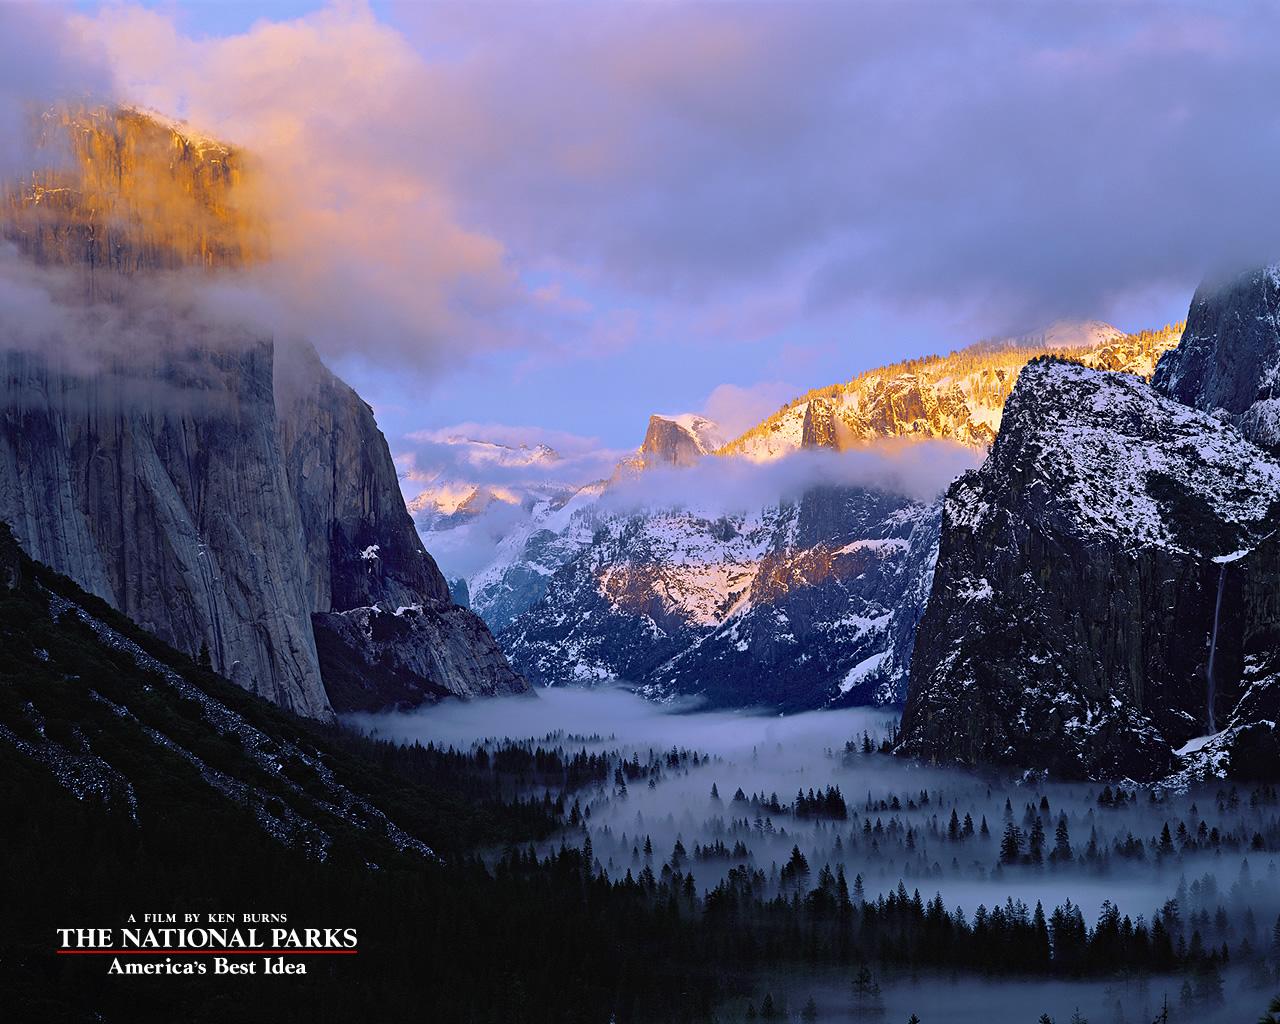 Yosemite Yosemite National Park 1280x1024